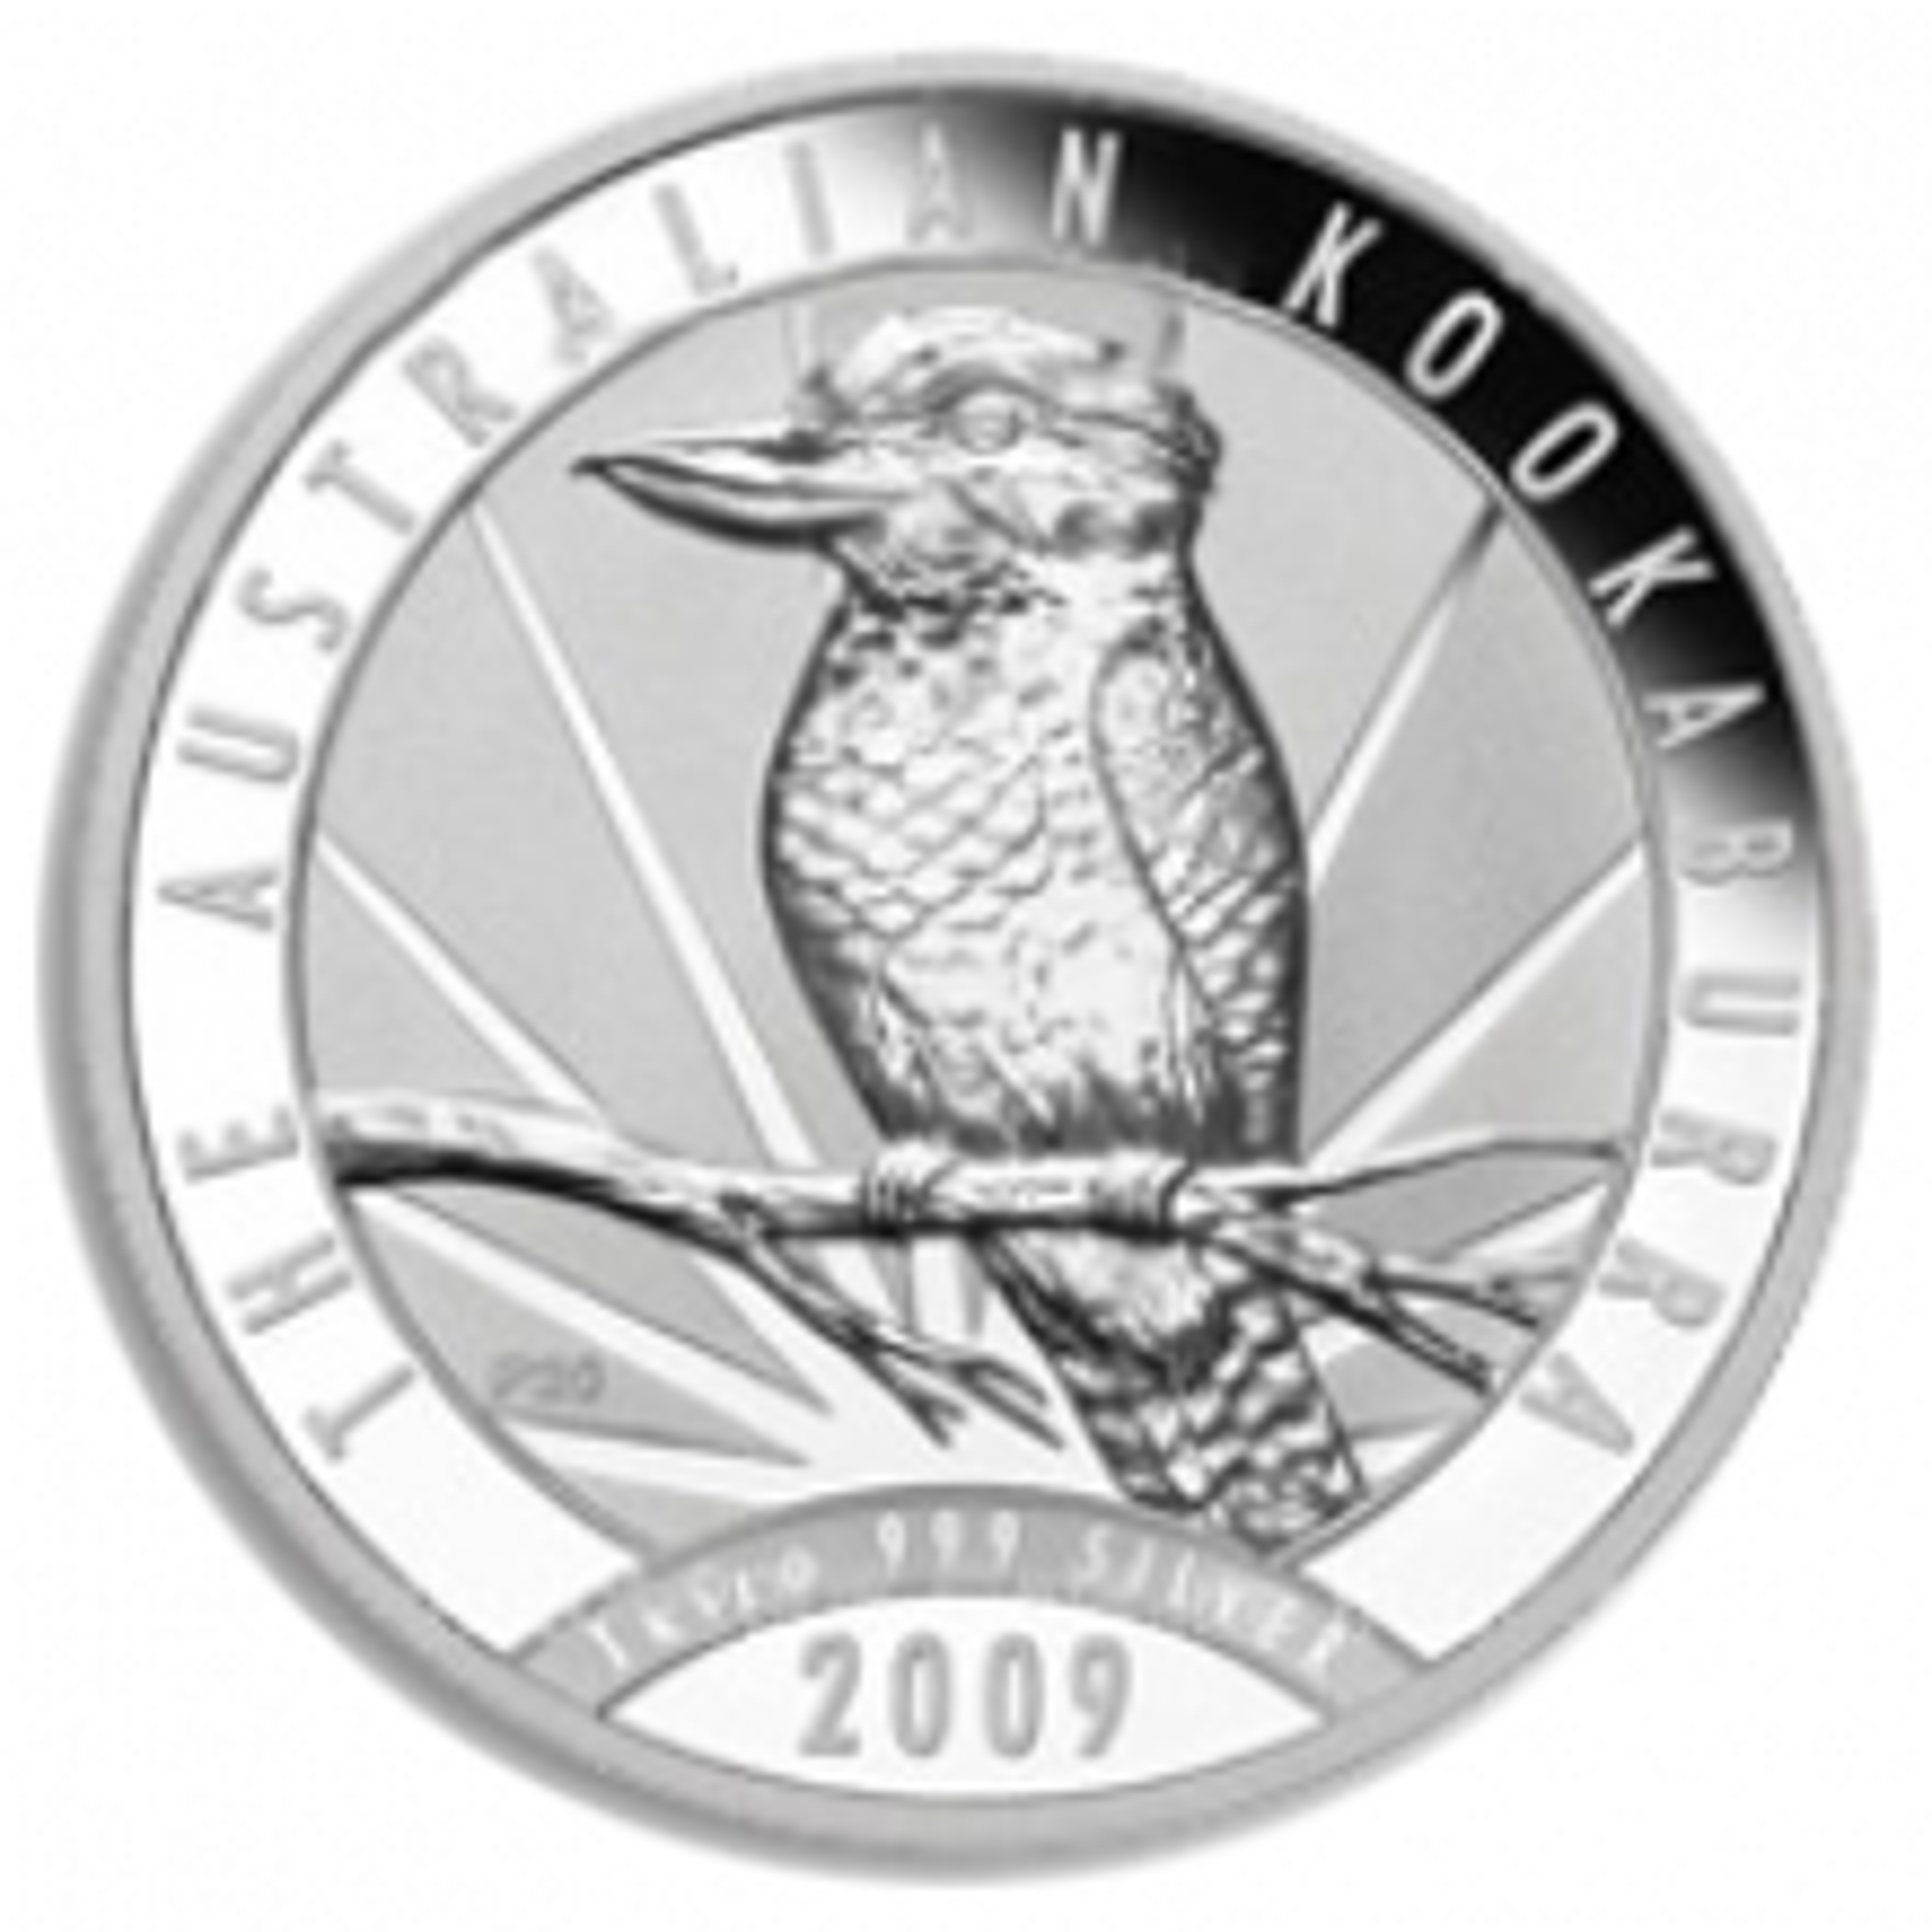 1 troy ounce zilver munt Kookaburra 2009